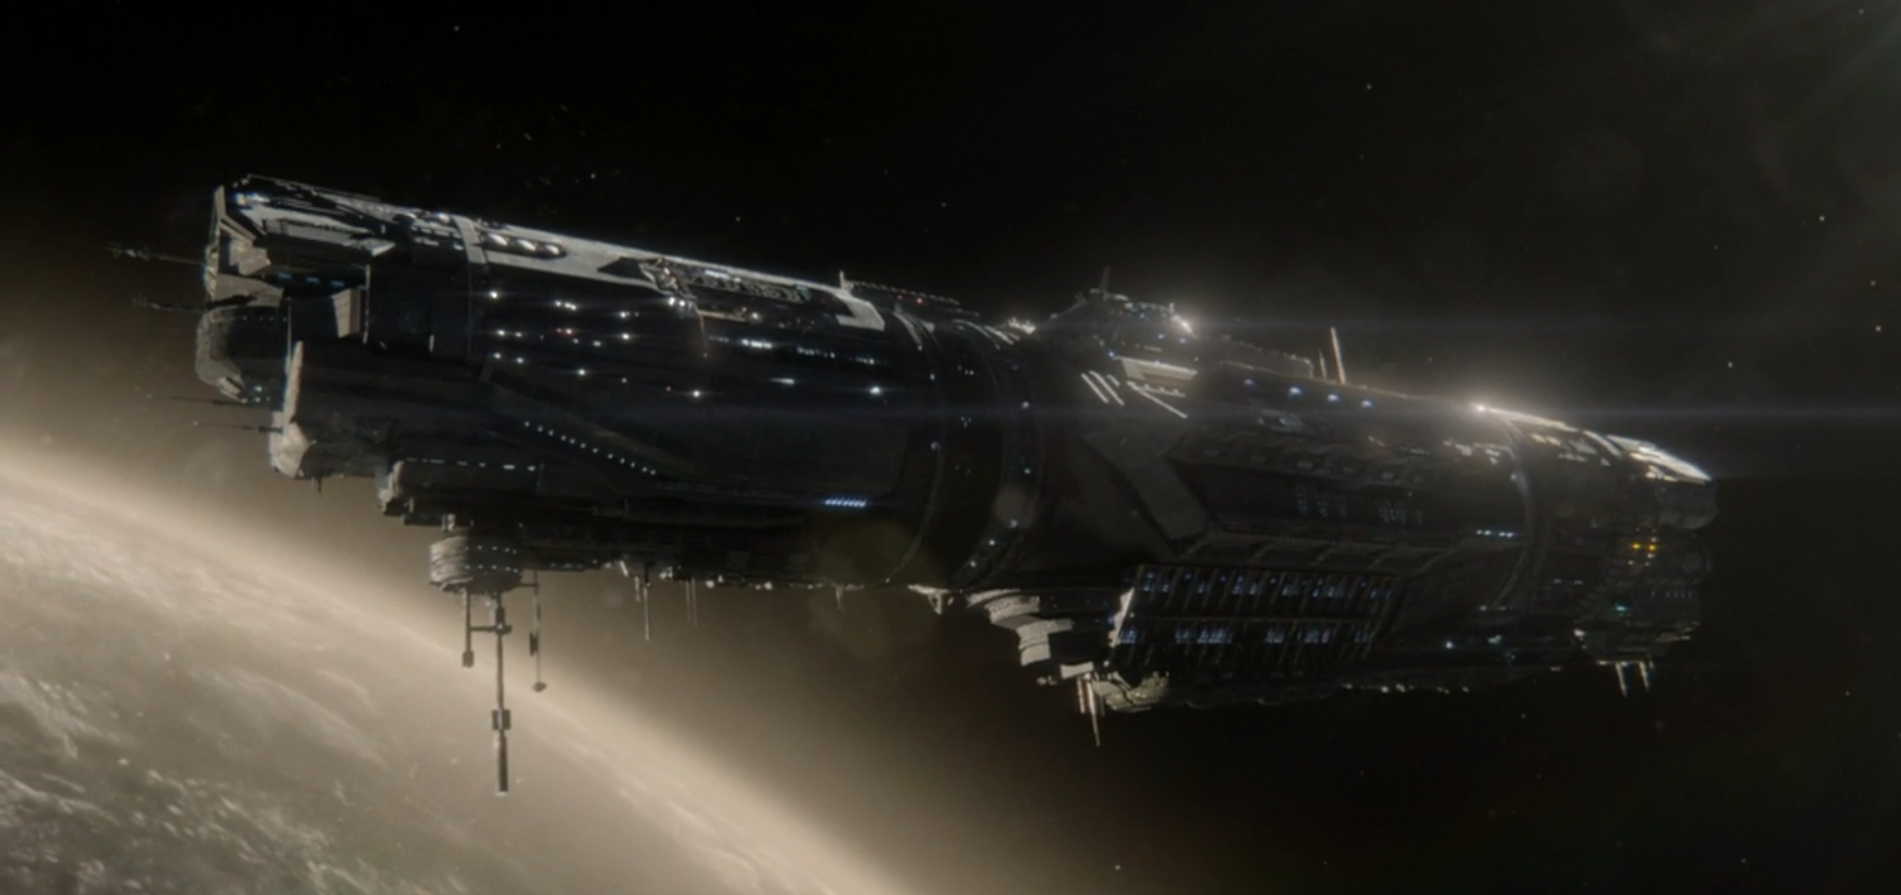 Eligius-class Battleship